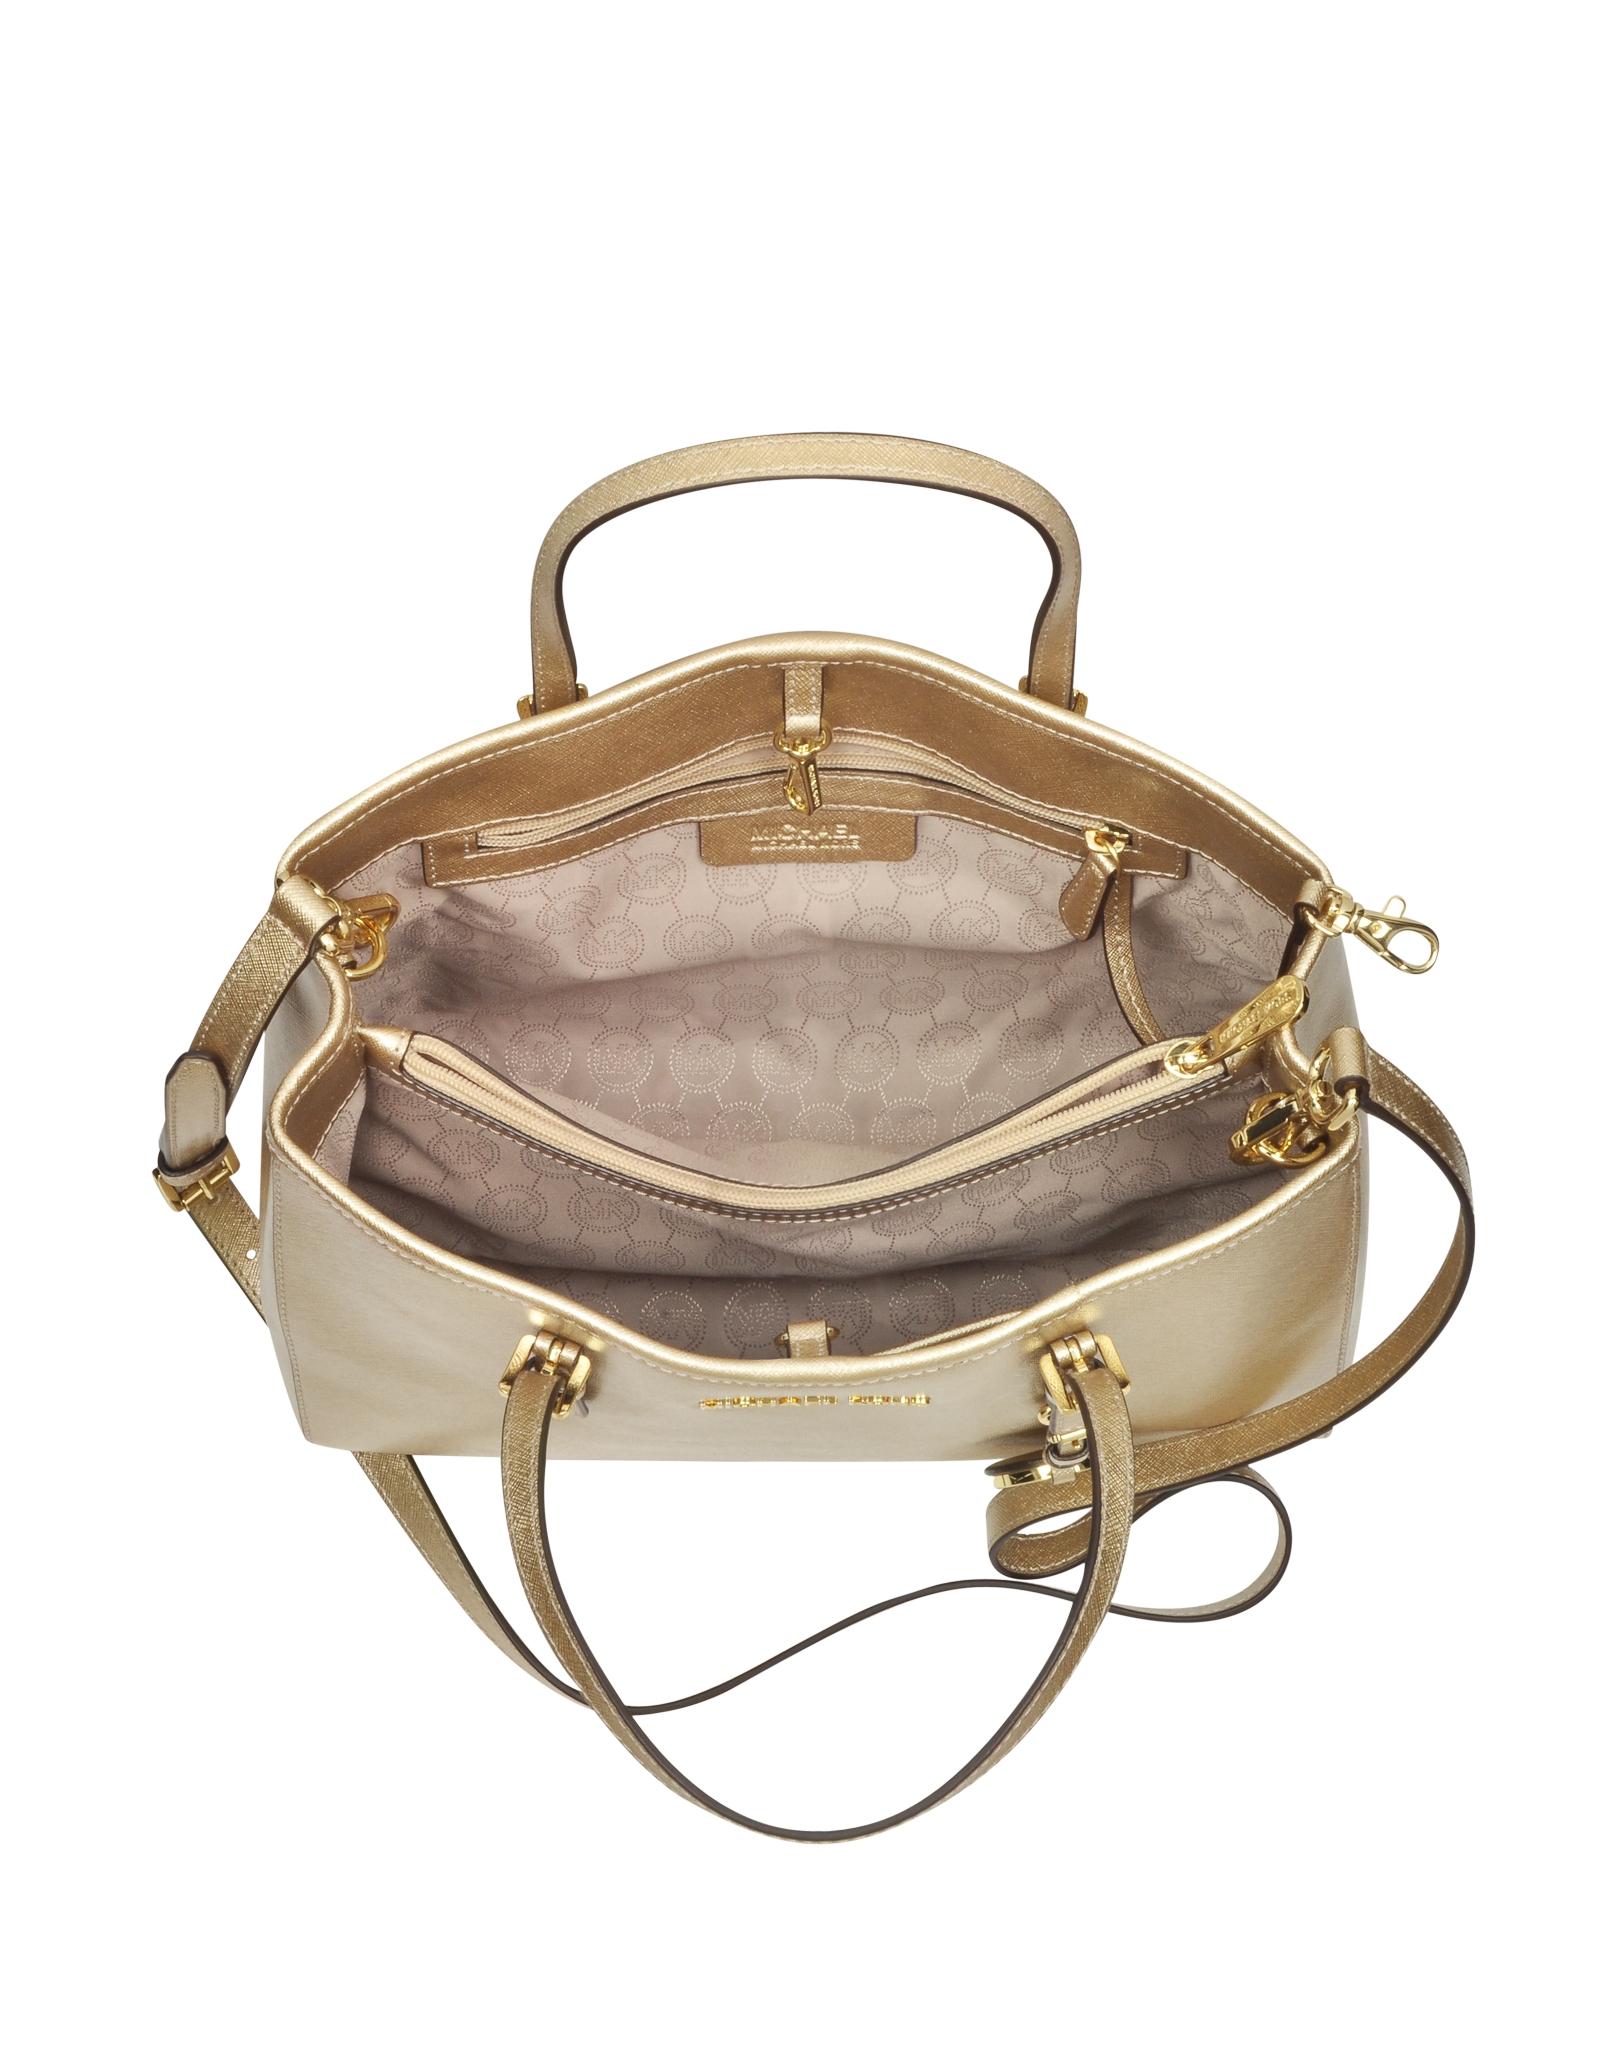 michael kors jet set travel pale gold metallic saffiano leather medium ew tote in metallic lyst. Black Bedroom Furniture Sets. Home Design Ideas